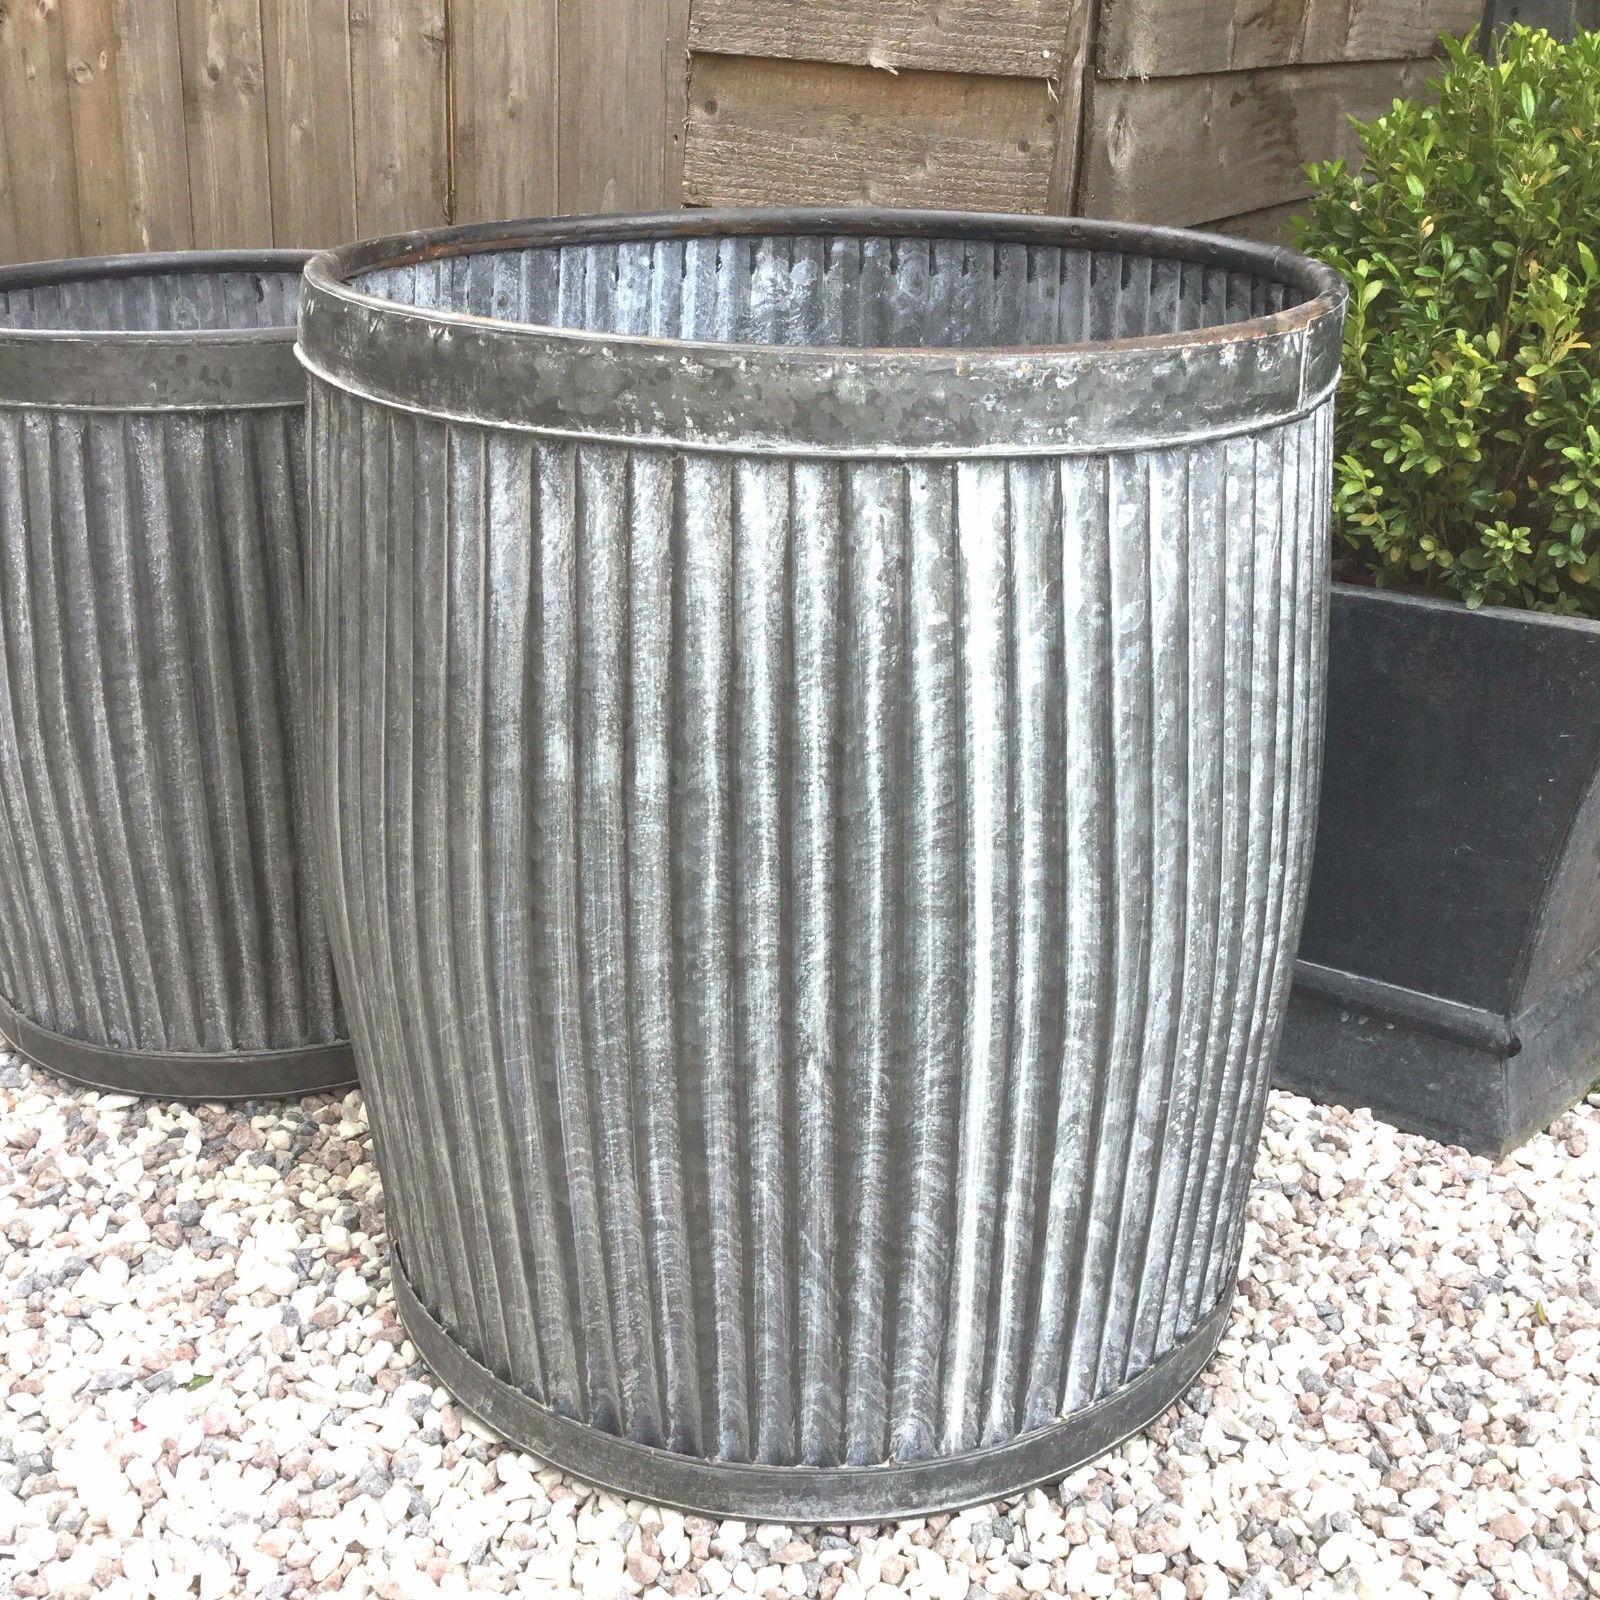 Large Vintage Style Round Galvanised Metal Garden Planter Tub